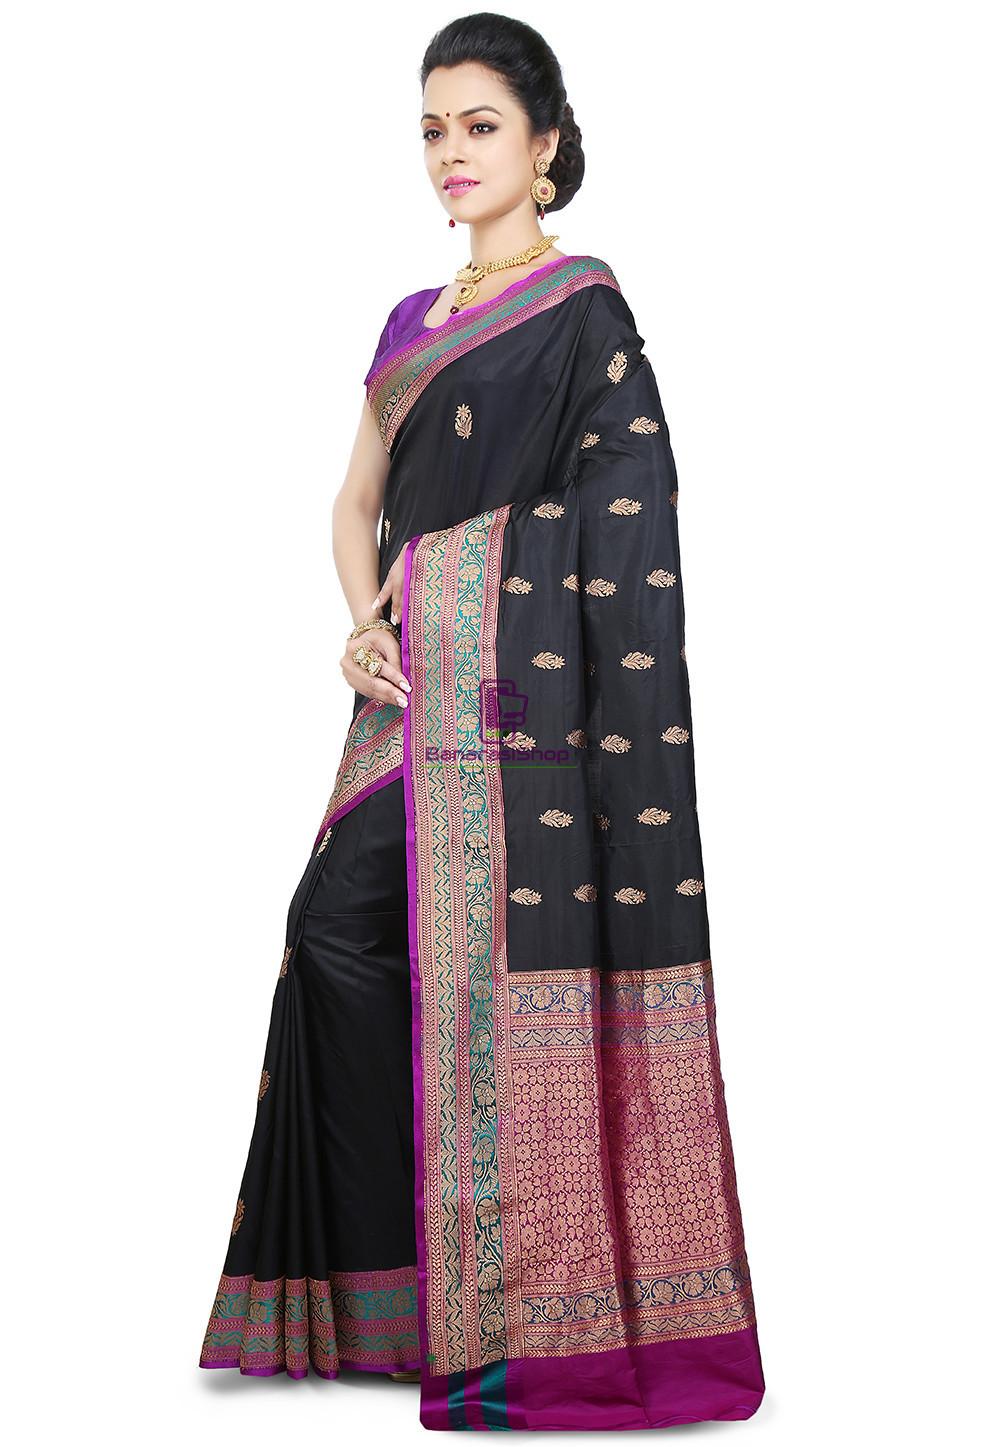 Banarasi Pure Katan Silk Handloom Saree in Black 5